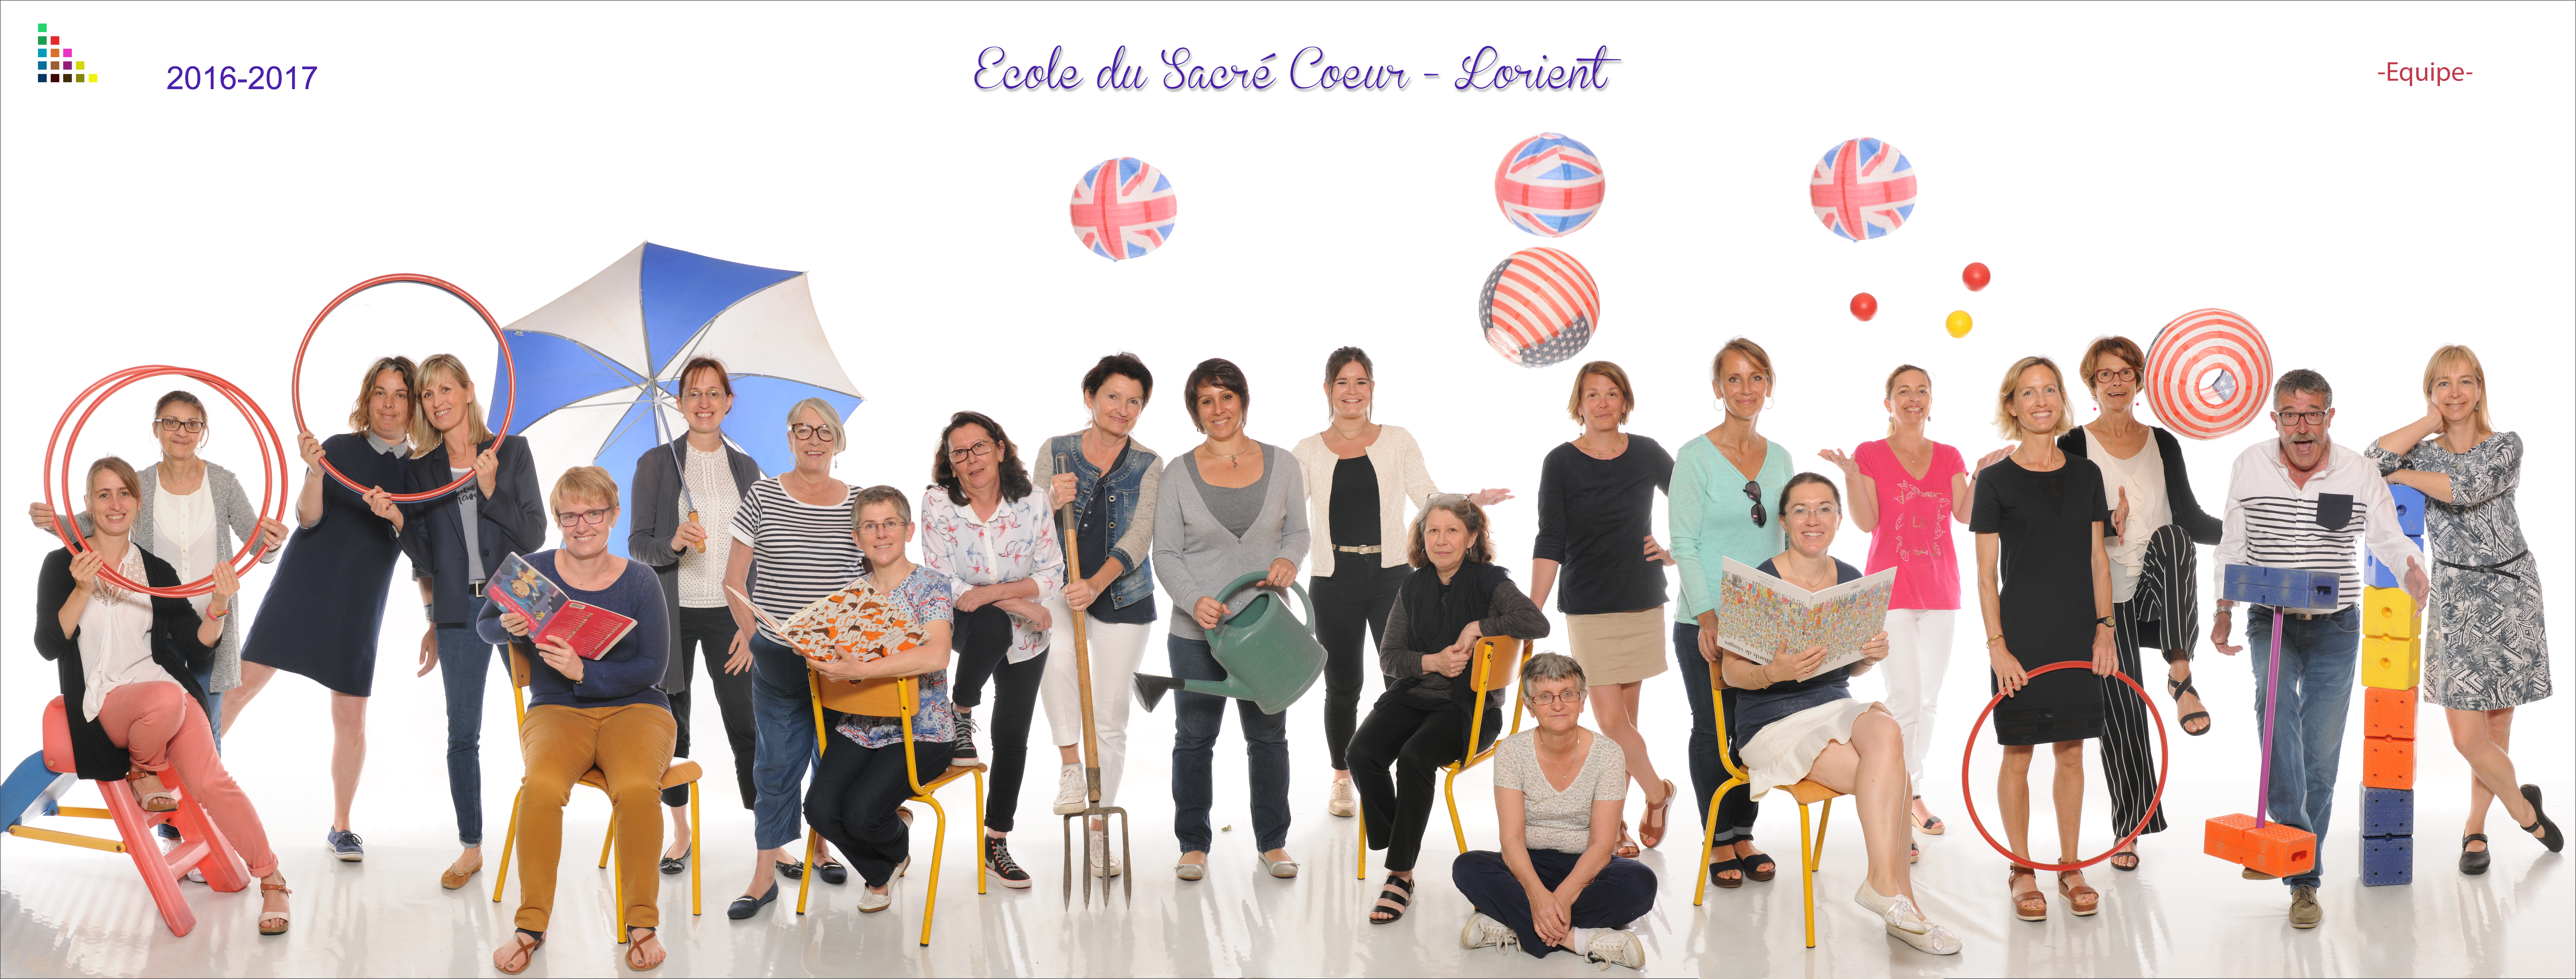 sacreCoeur-Equipe-